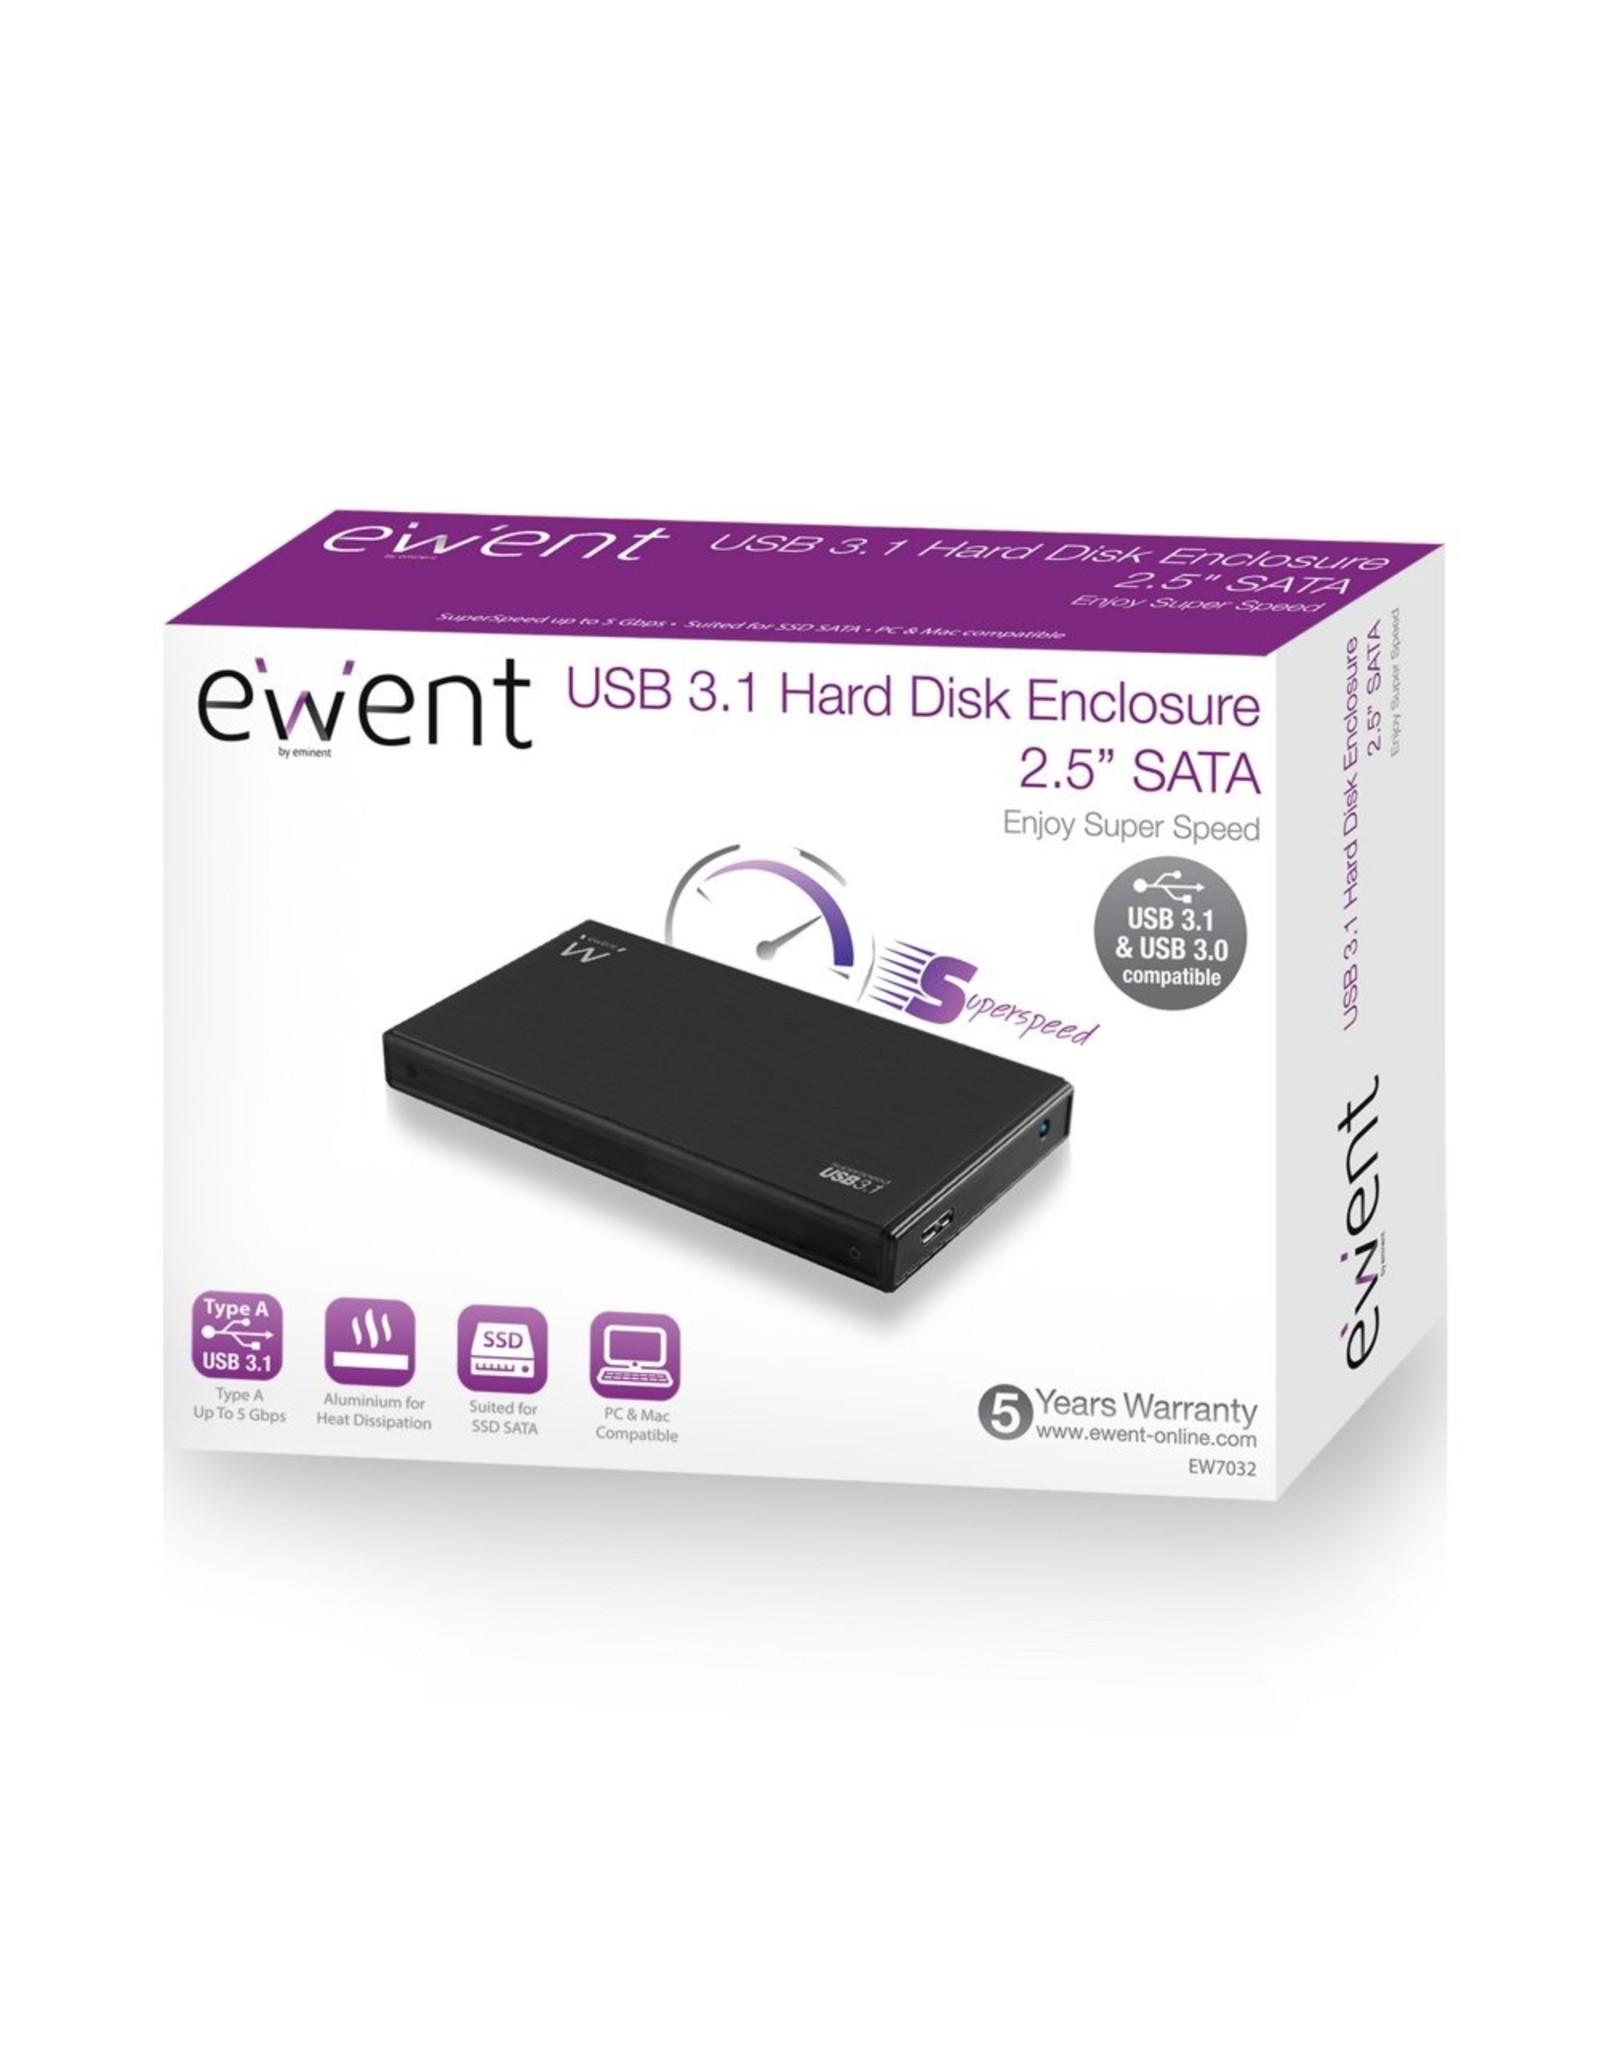 "Ewent USB 3.1 Gen1 (USB 3.0) 2.5"" SATA Hard Disk and SSD"